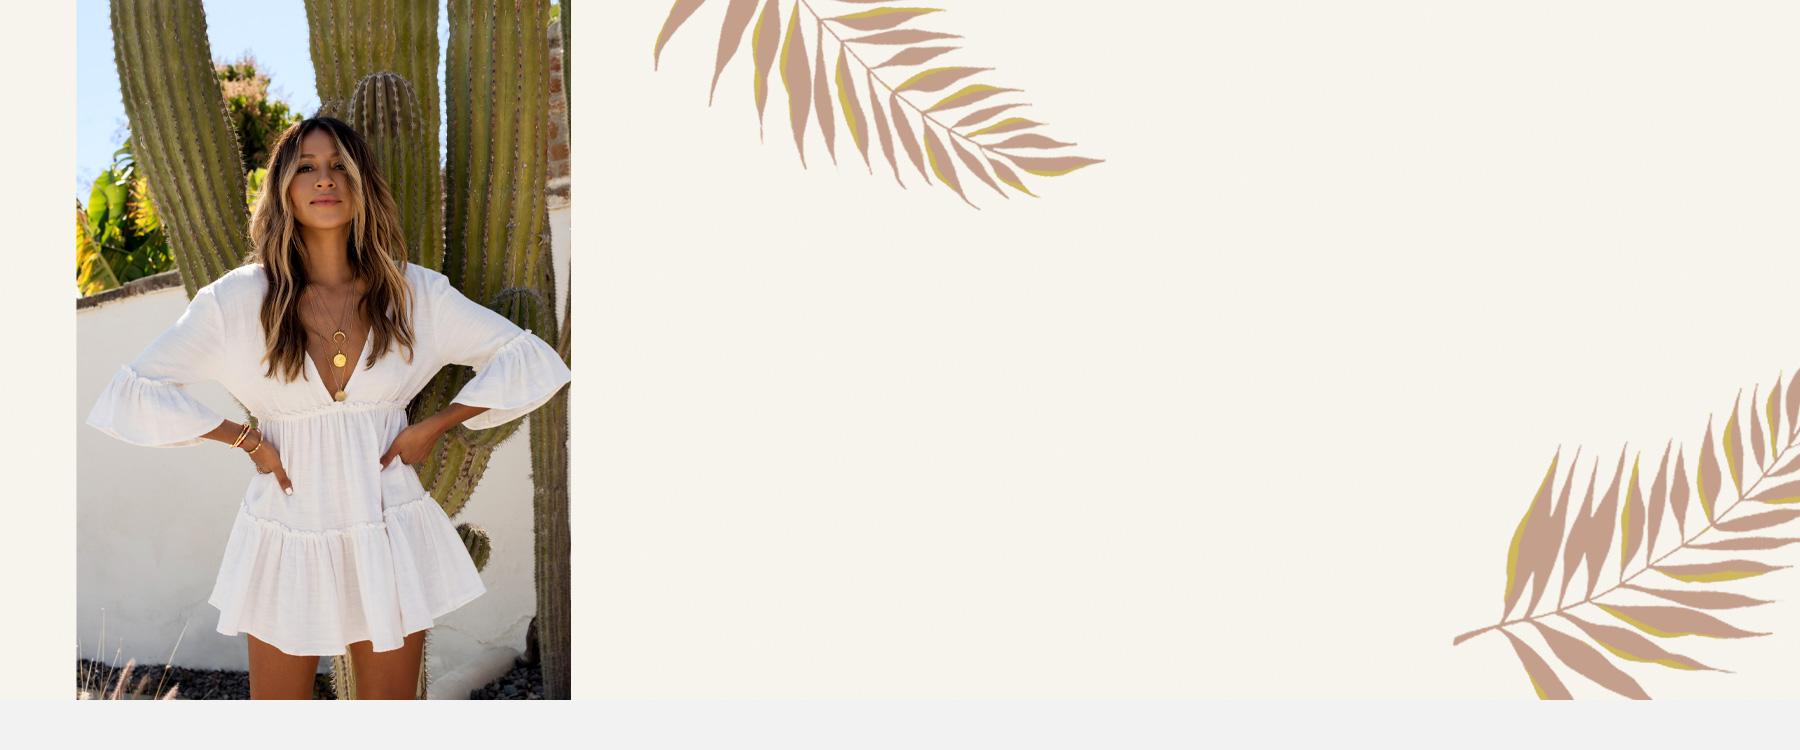 Girl wearing a white Billabong X Sincerely Jules Dress